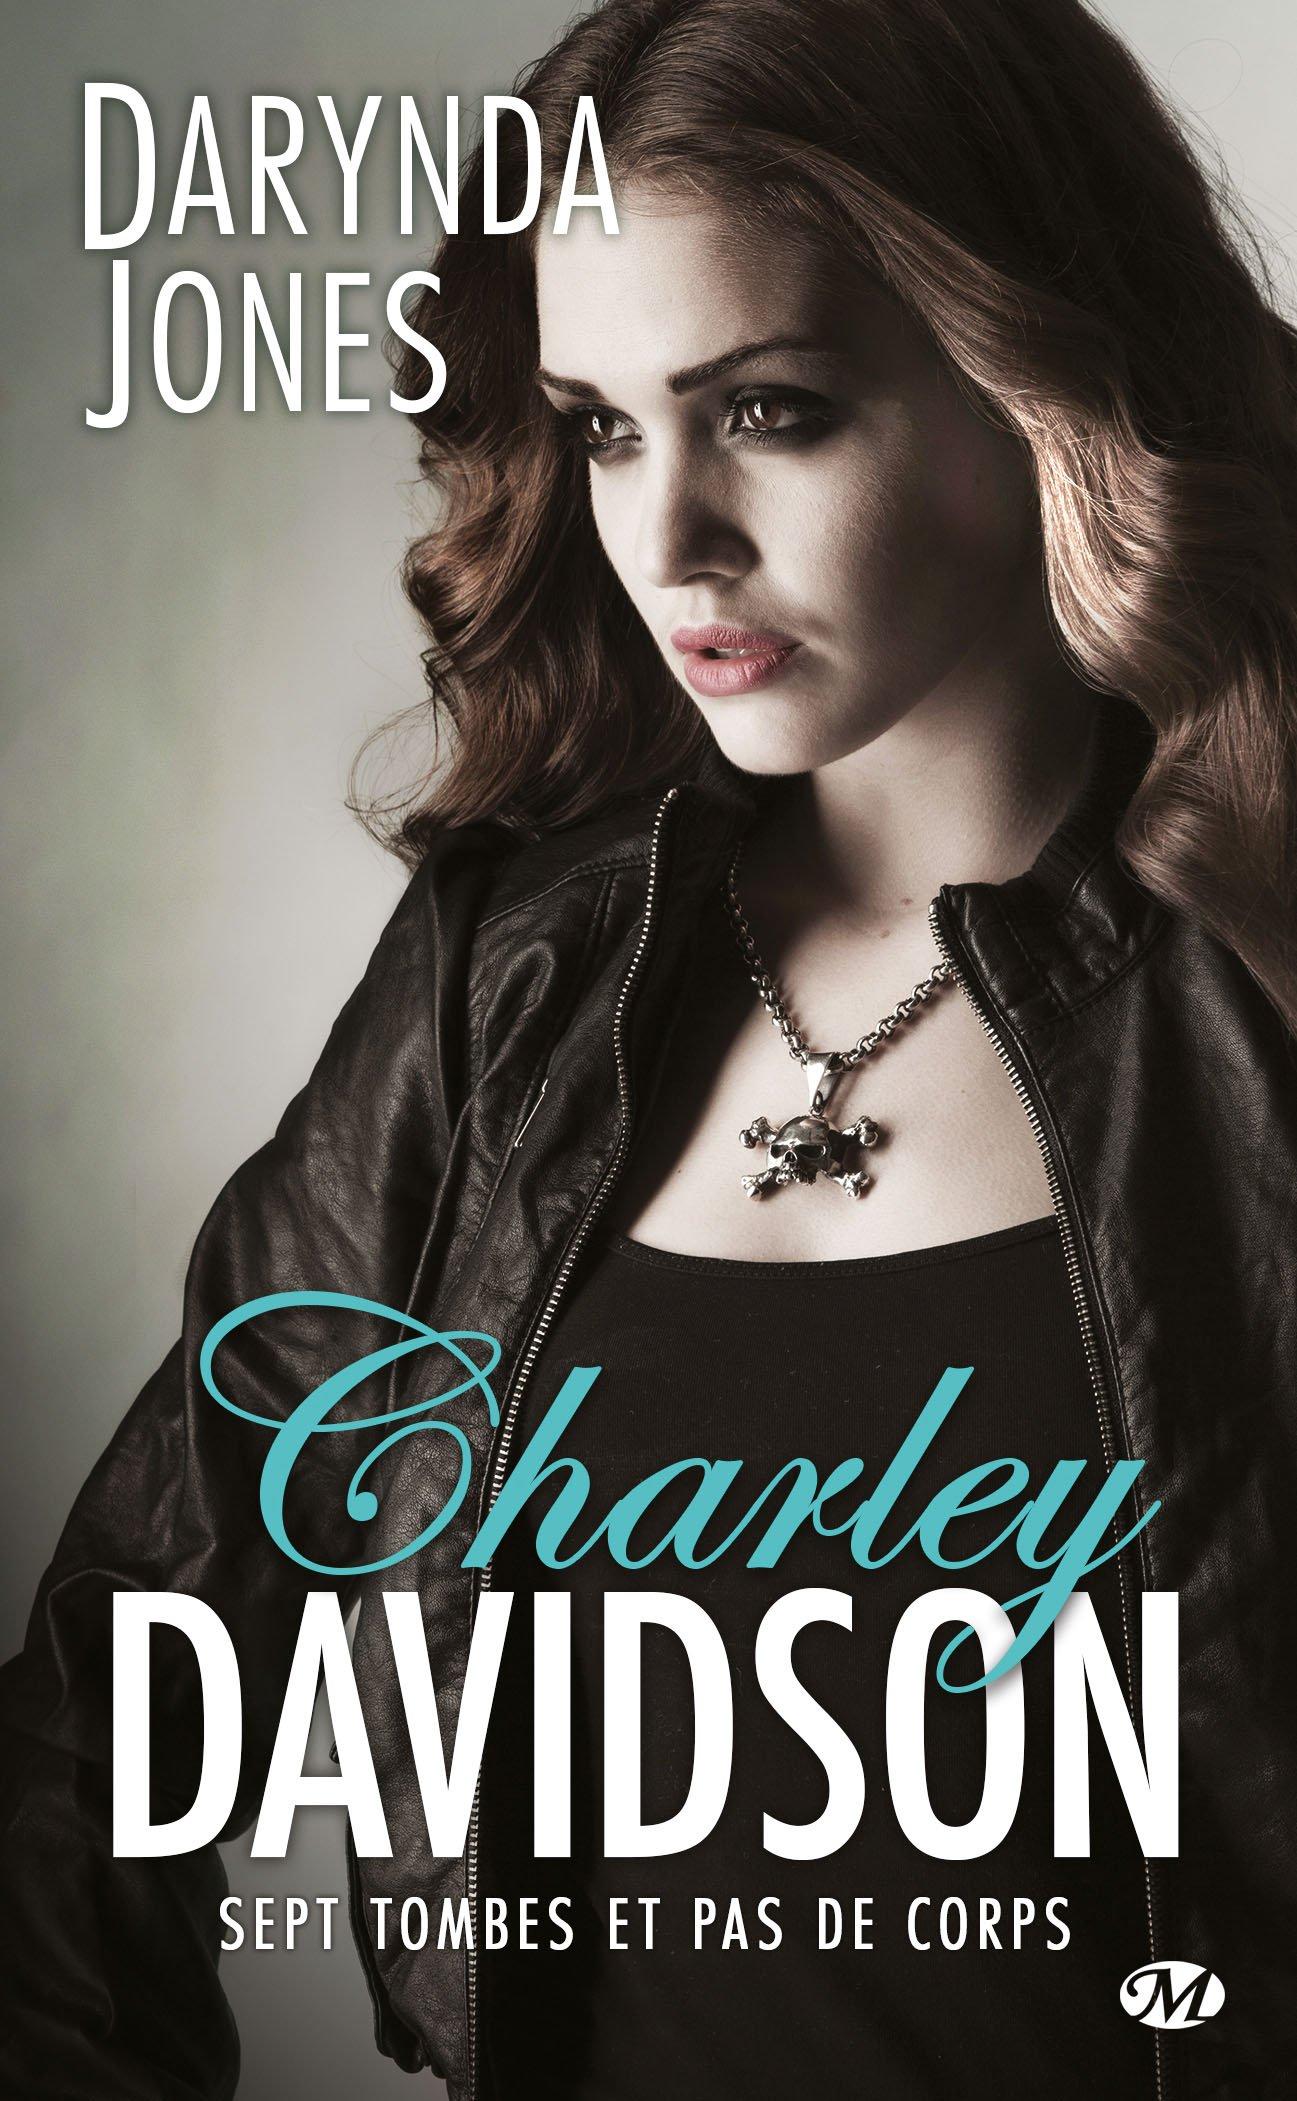 Charley Davidson, Tome 7 : Sept tombes et pas de corps 81QfRGKZV0L